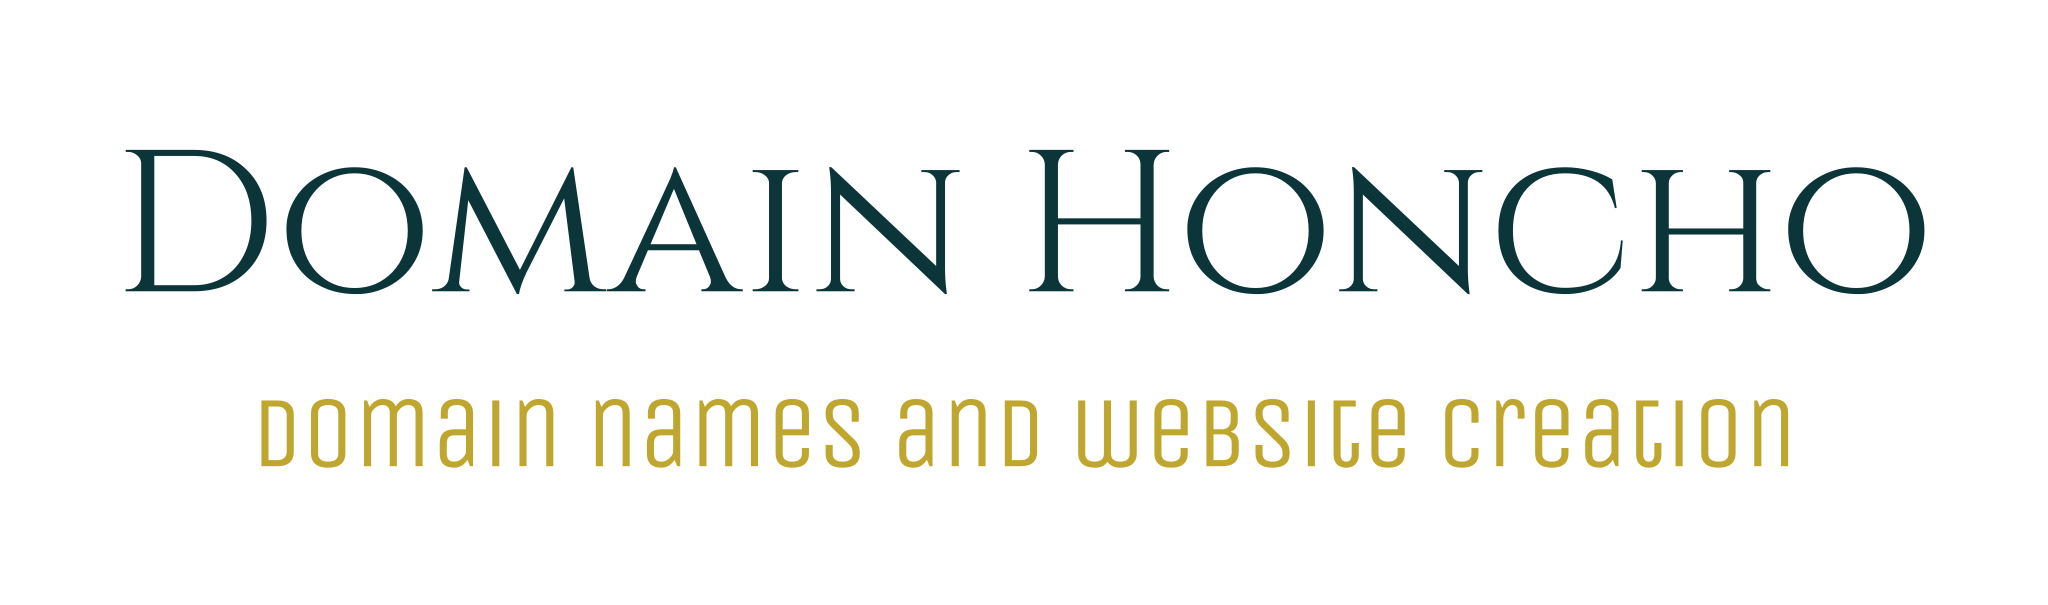 Domain Honcho